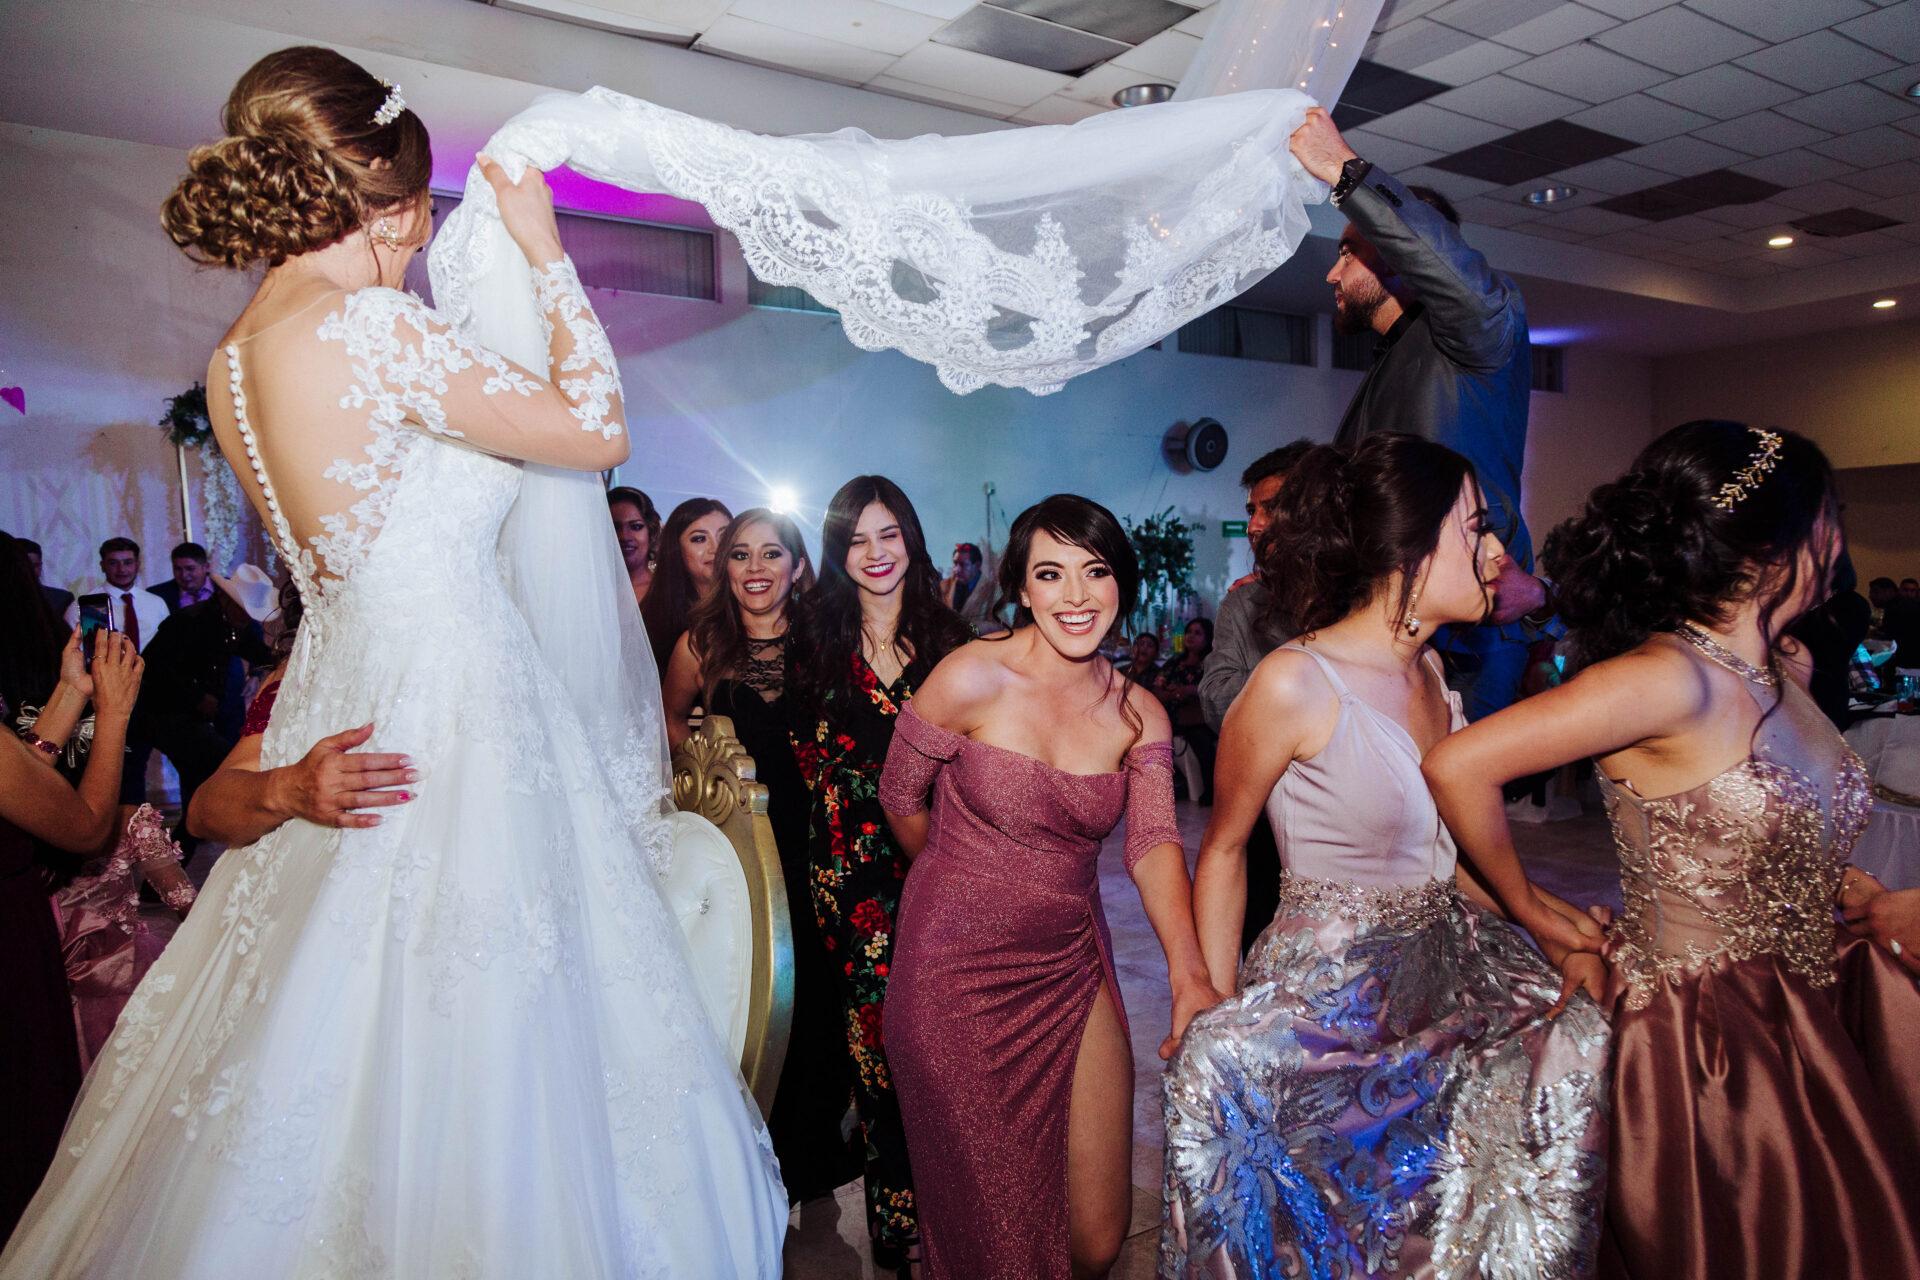 javier_noriega_fotografo_bodas_zacatecas_fresnillo_chihuahua_wedding_photographer20